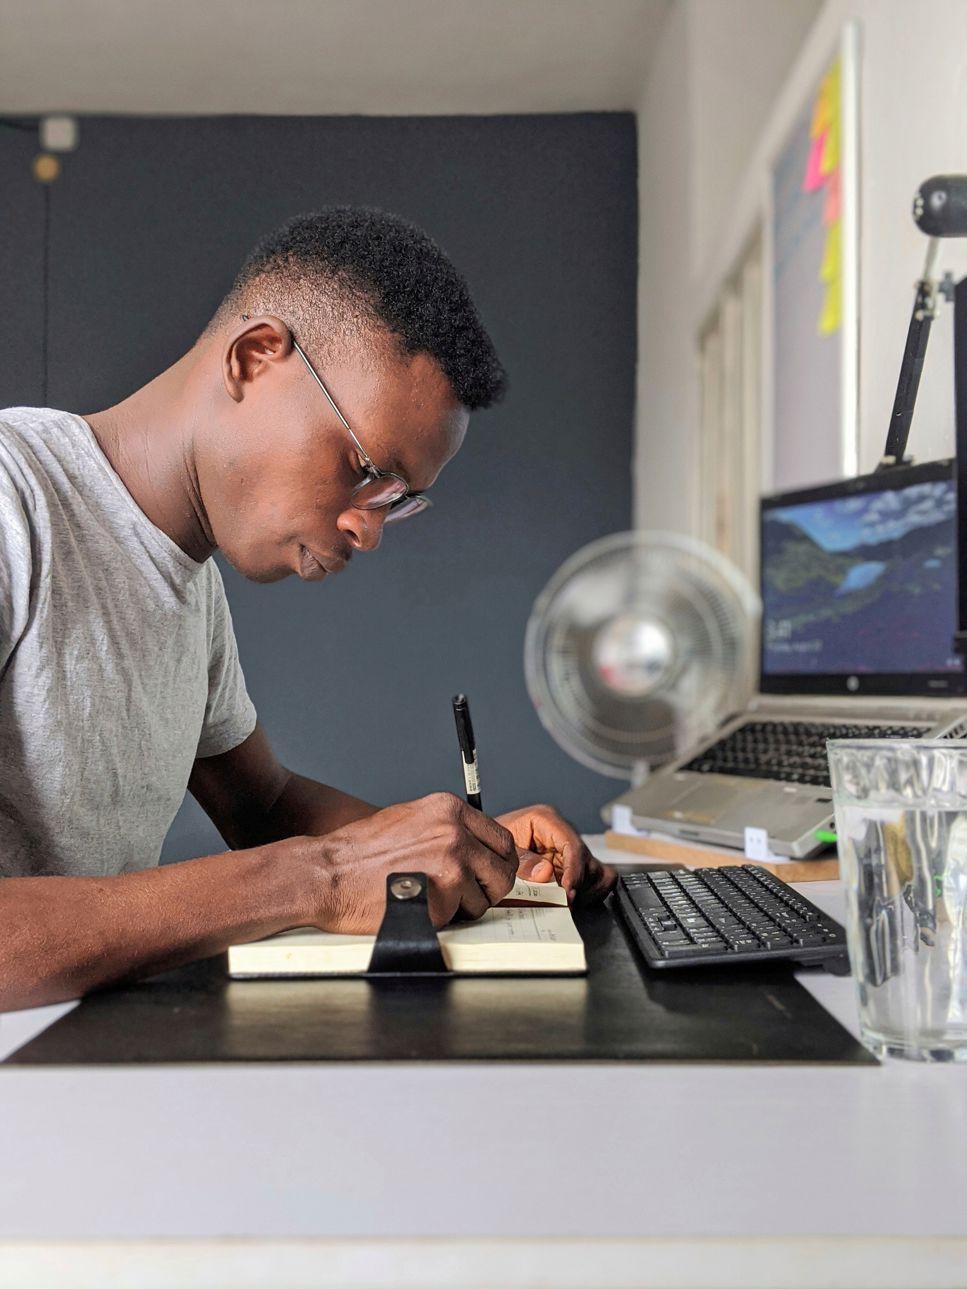 Student som arbetar